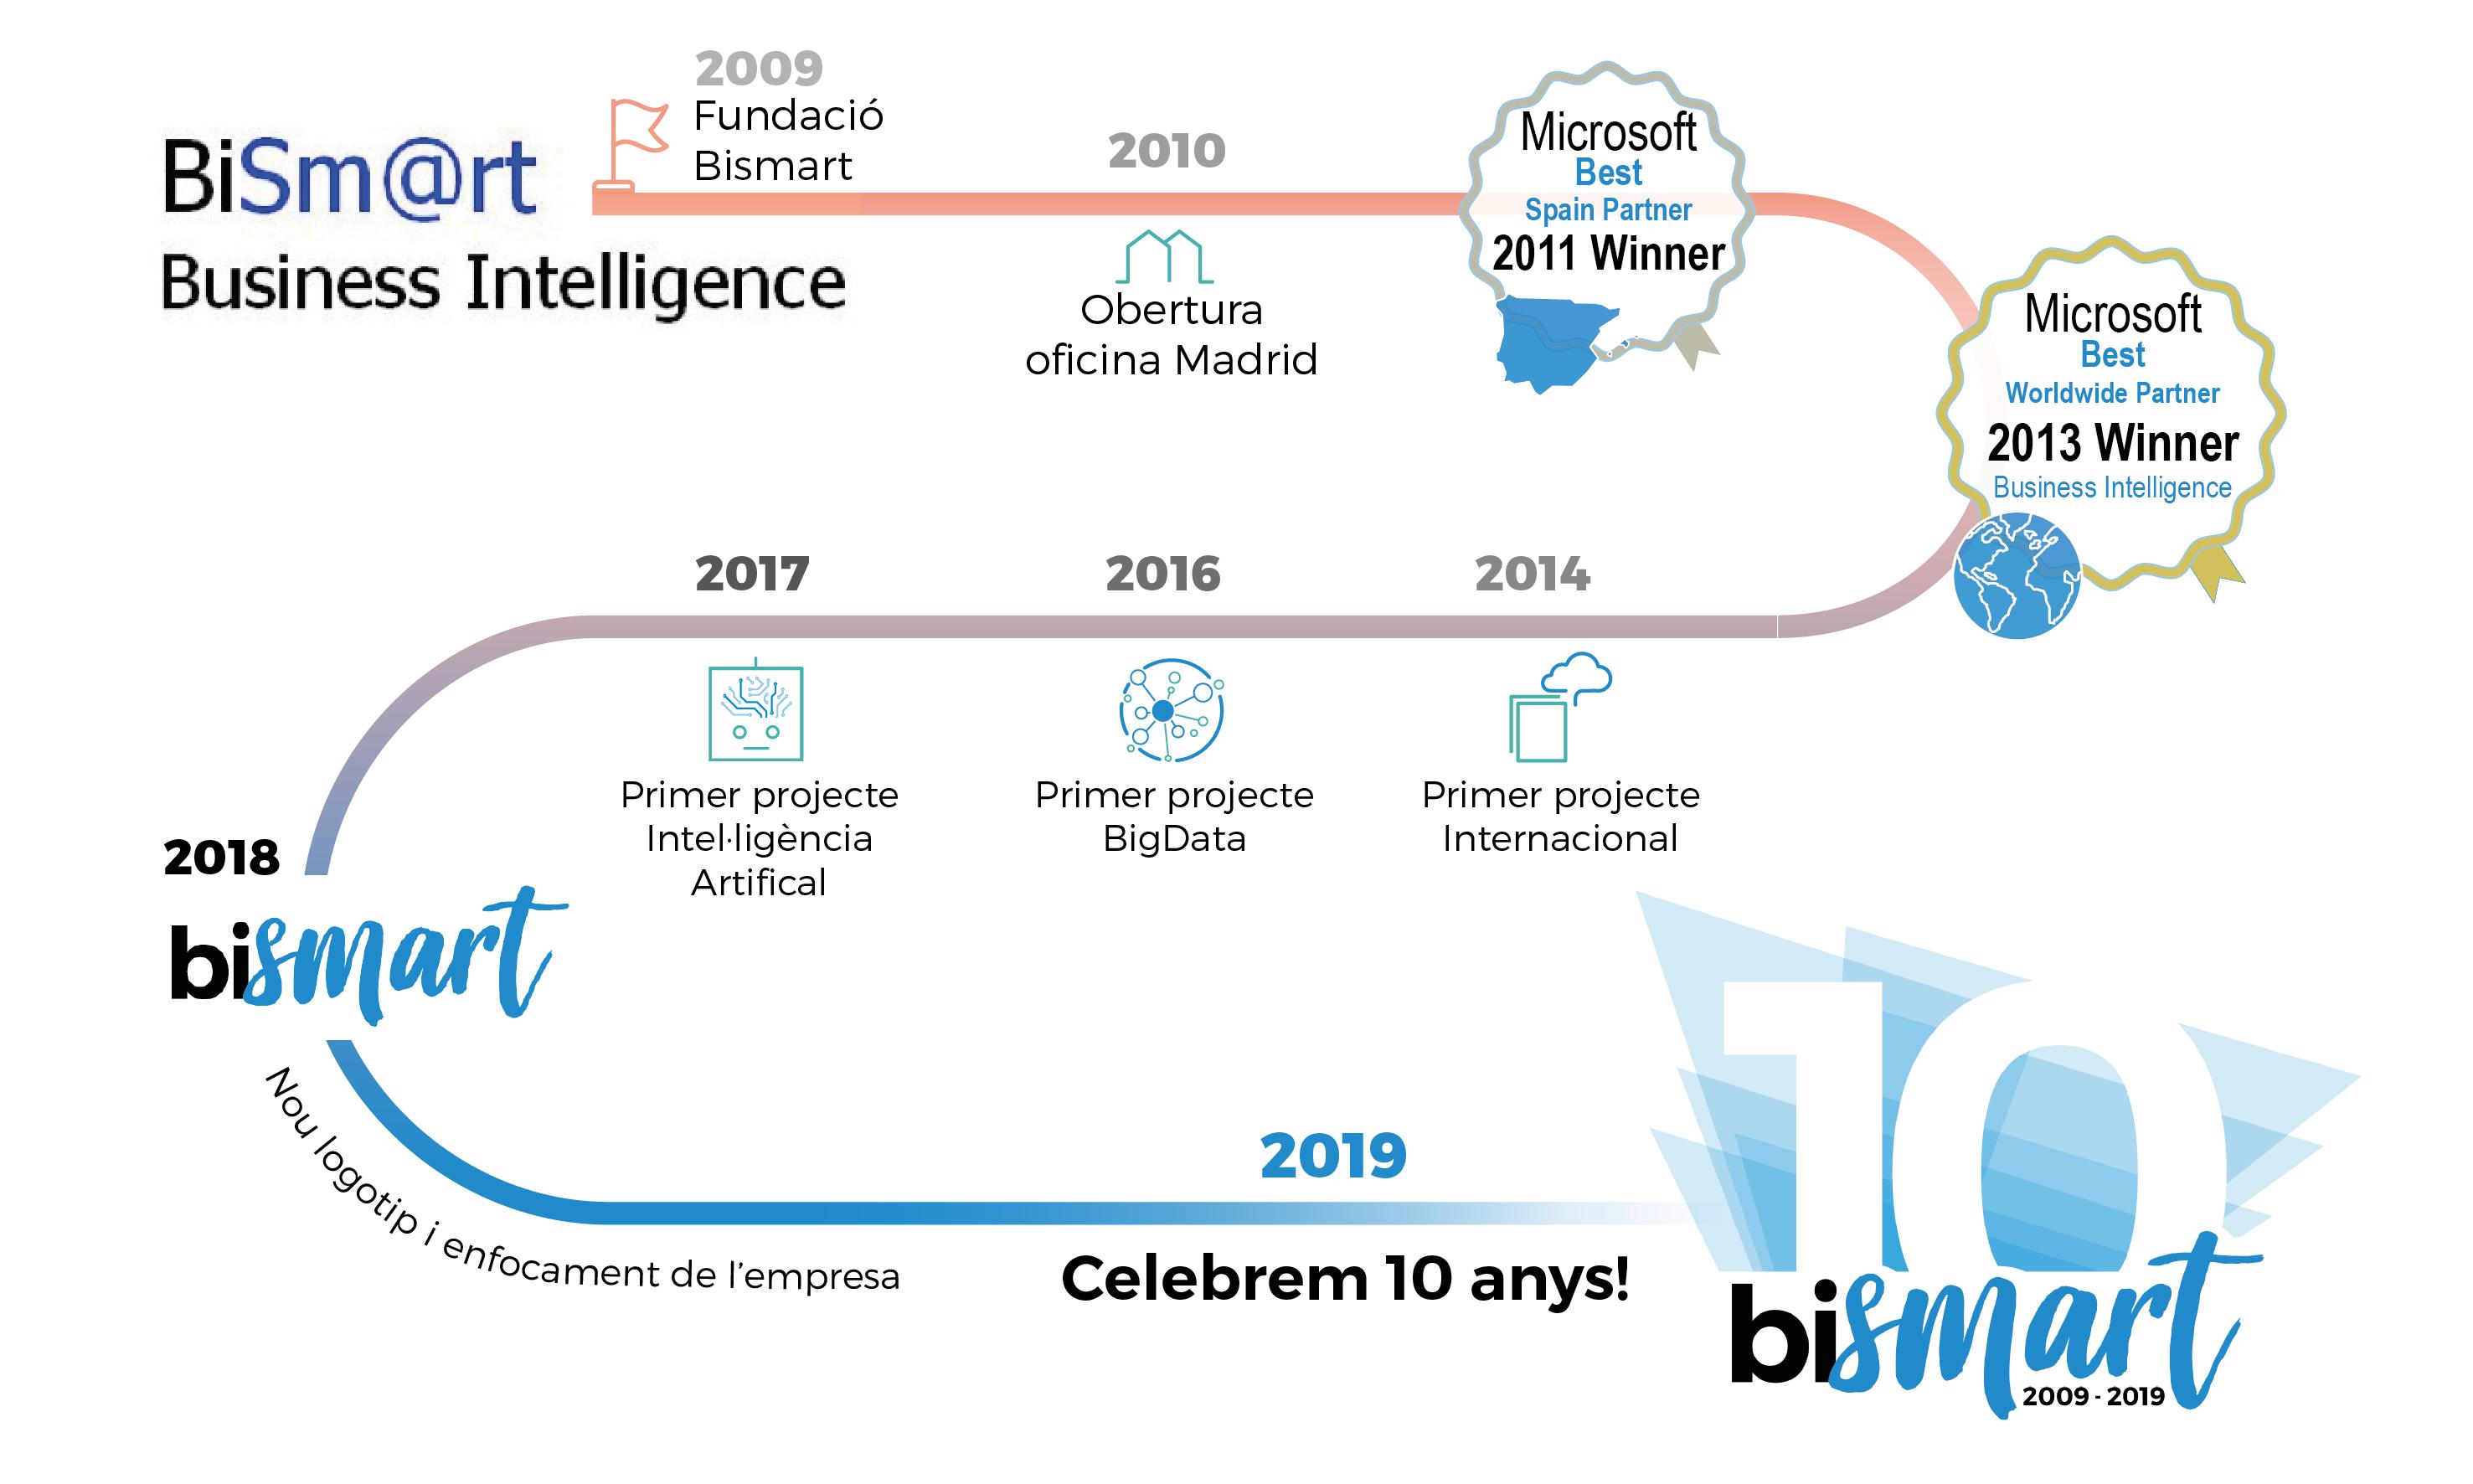 Bismart Business Intelligence Artificial Intelligence 10è aniversari